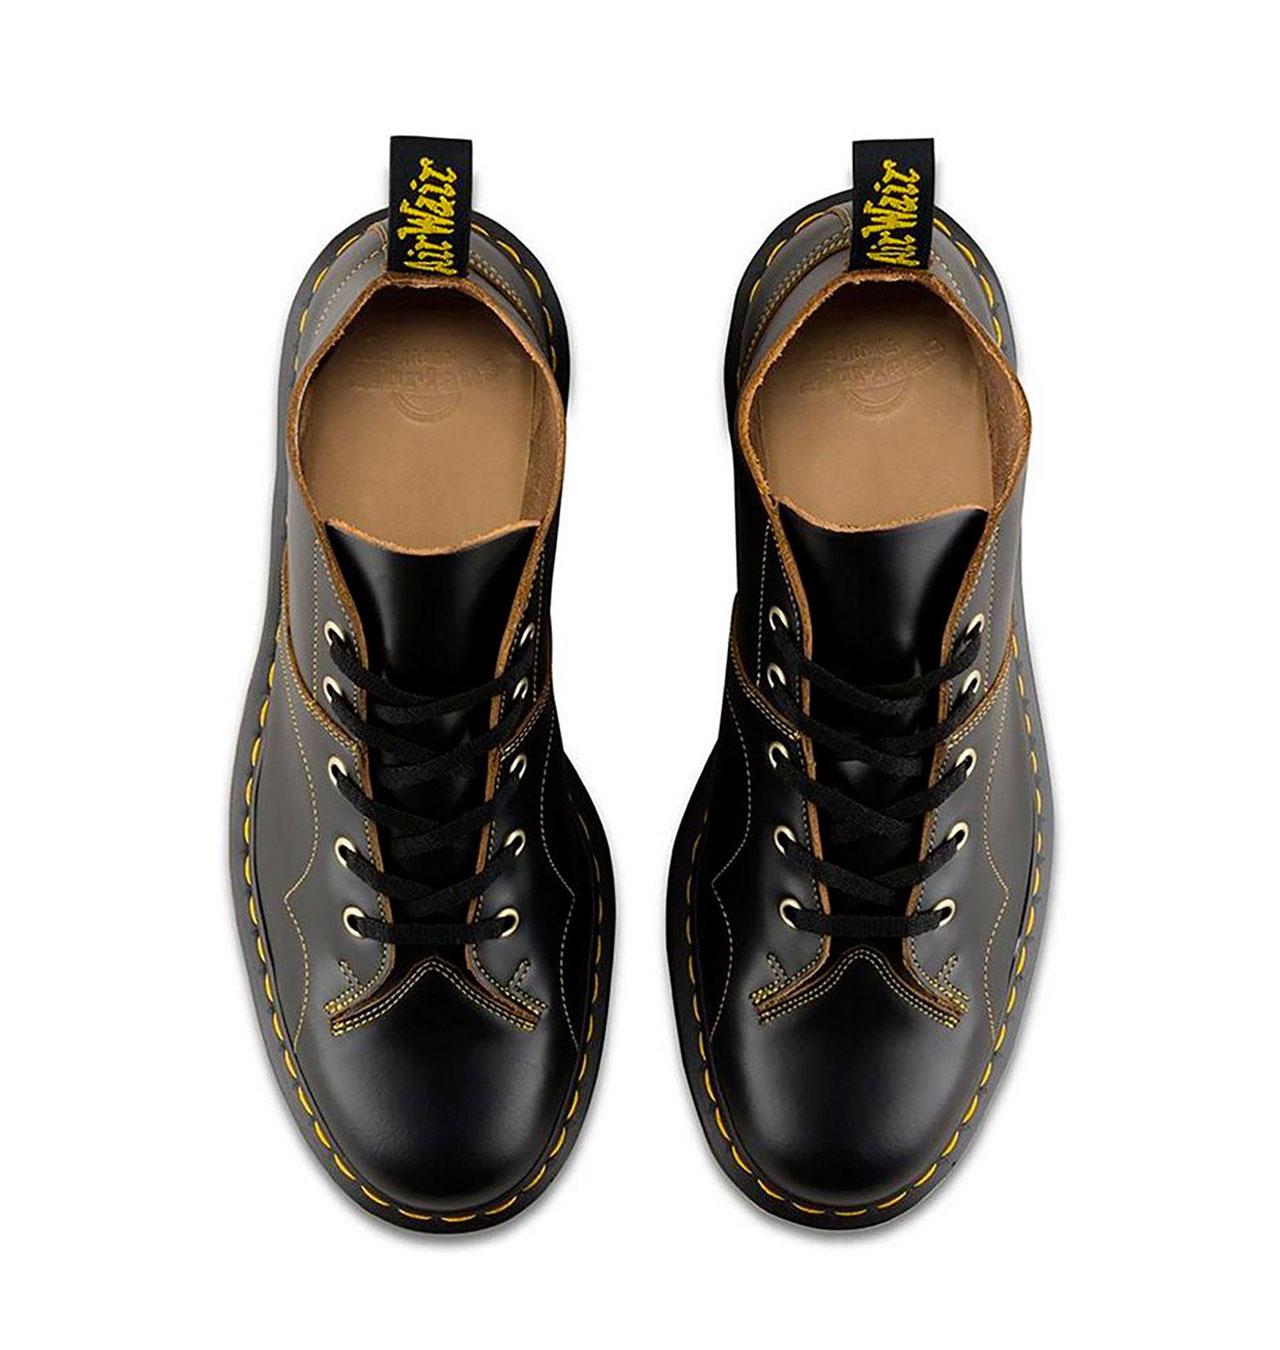 Dr Martens Church Monkey Boots Vintage Smooth Black